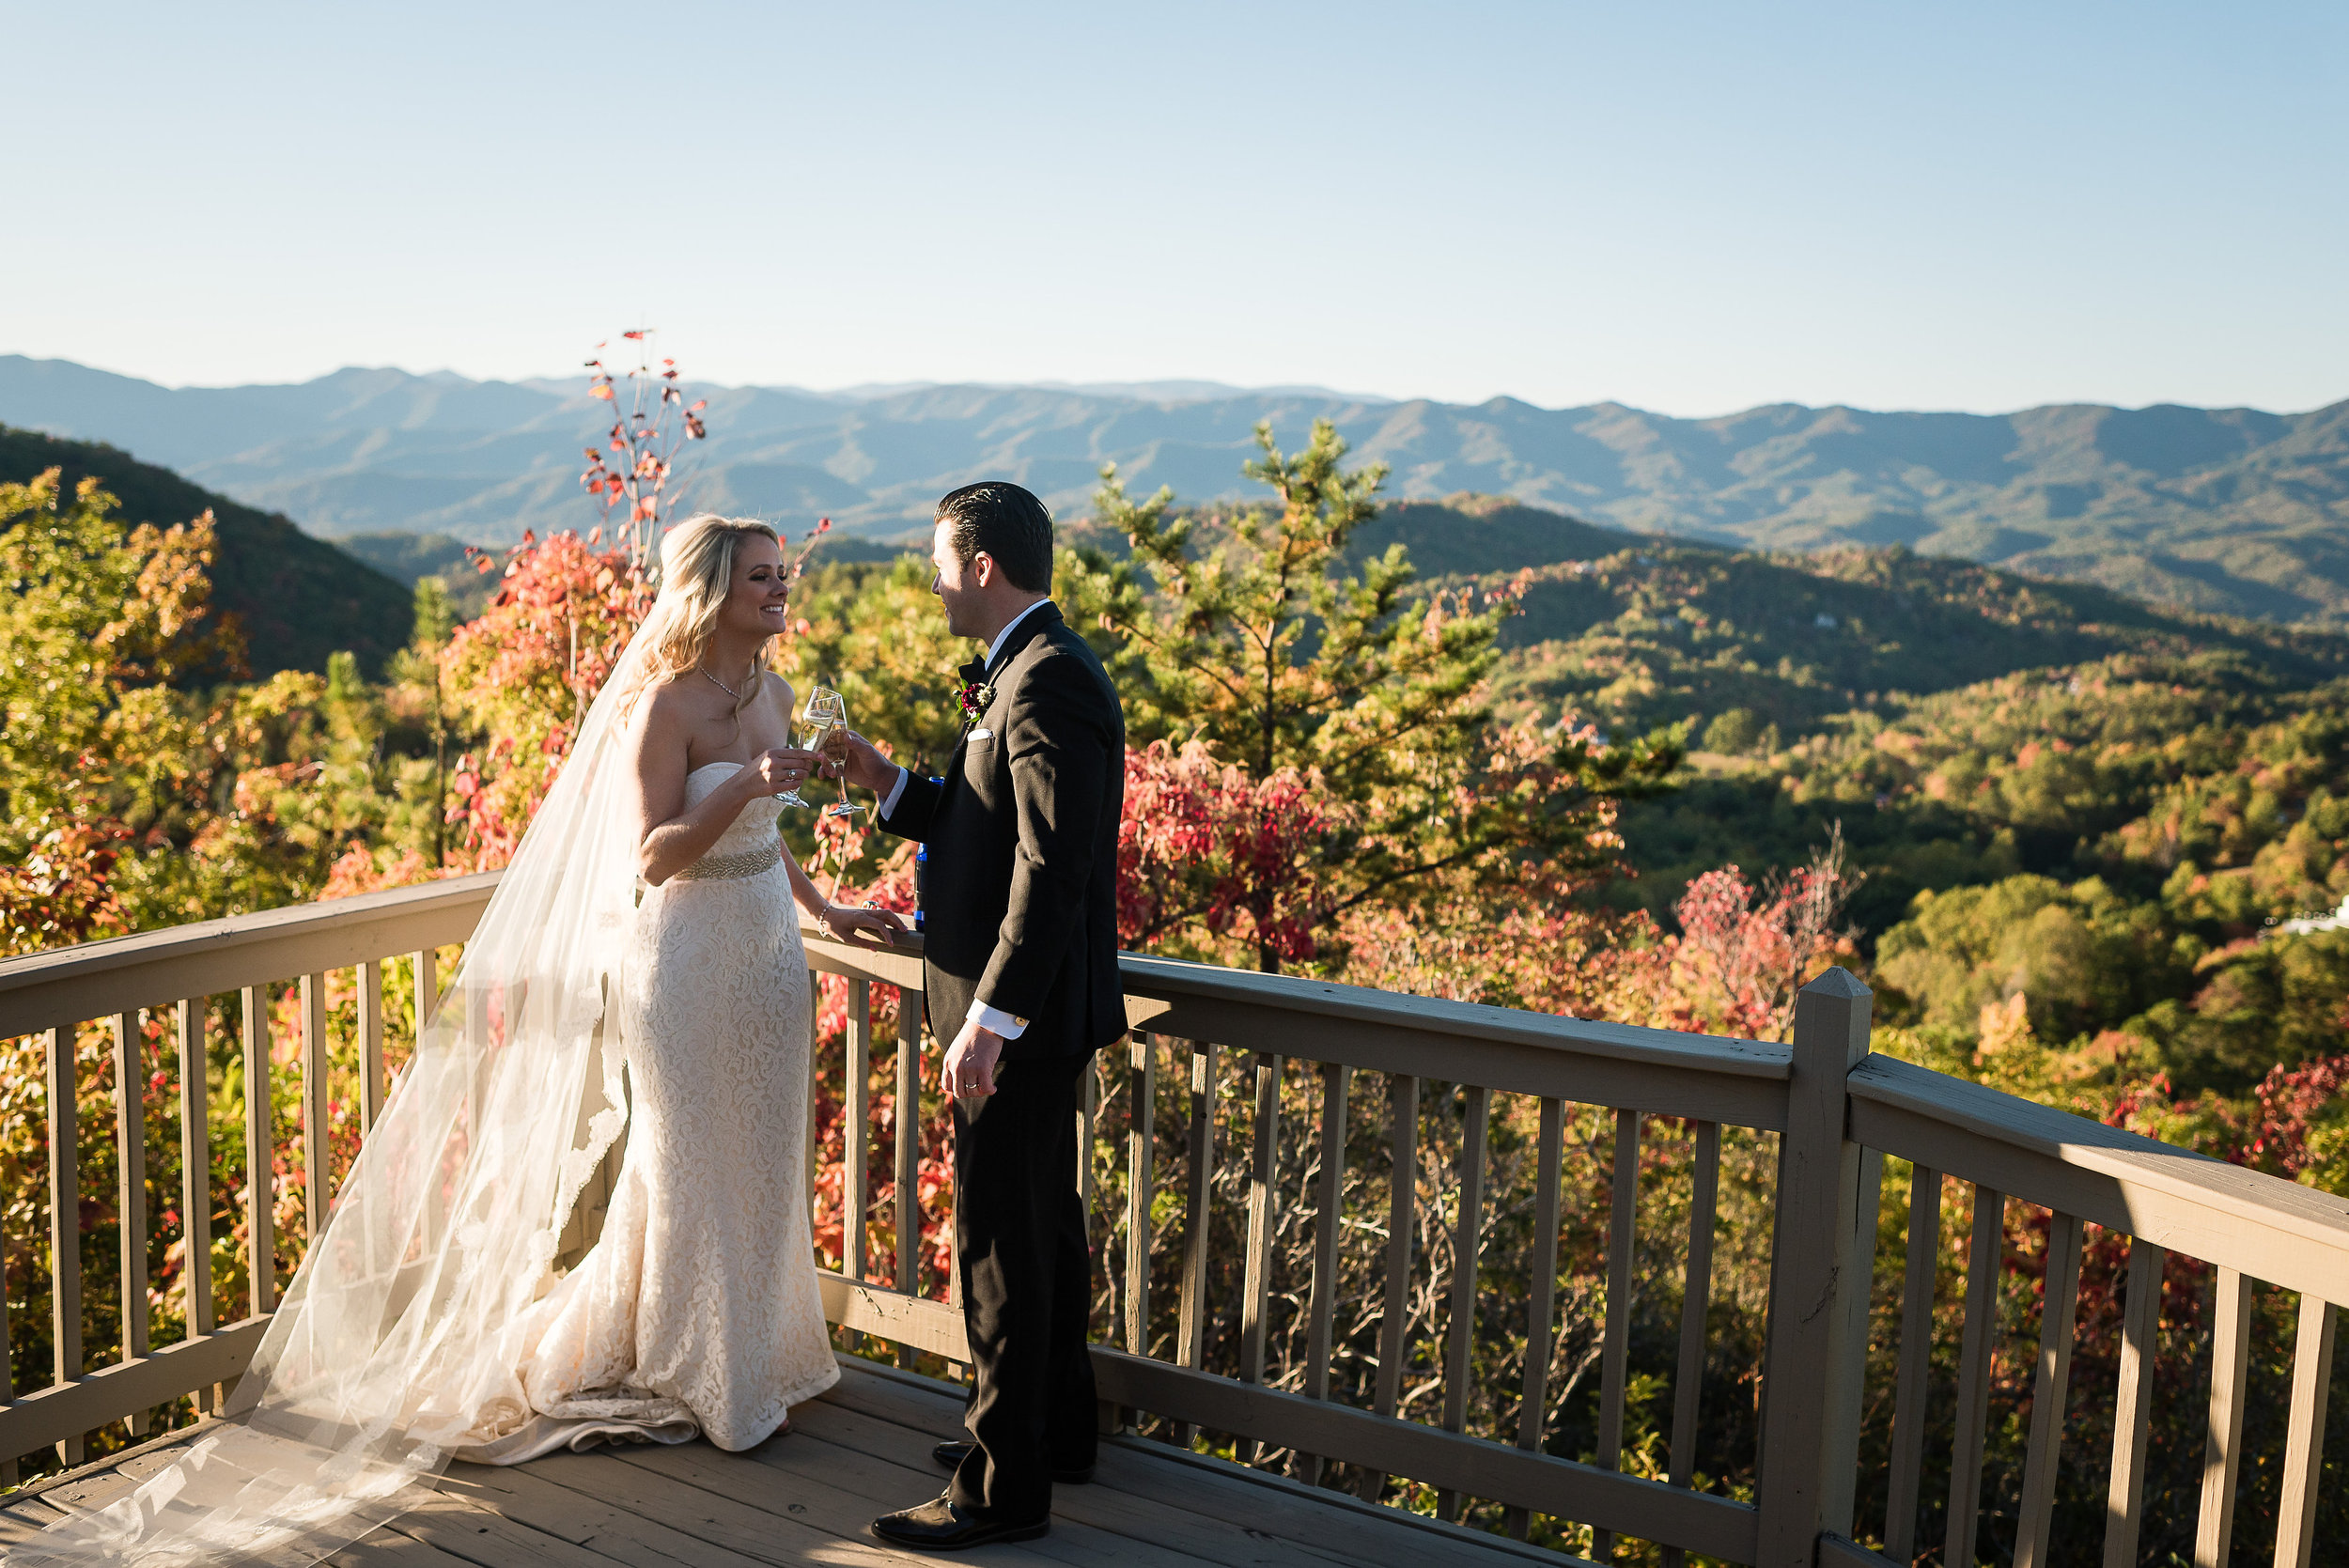 20161022_hawkesdene_fall_wedding_photos_1364.jpg